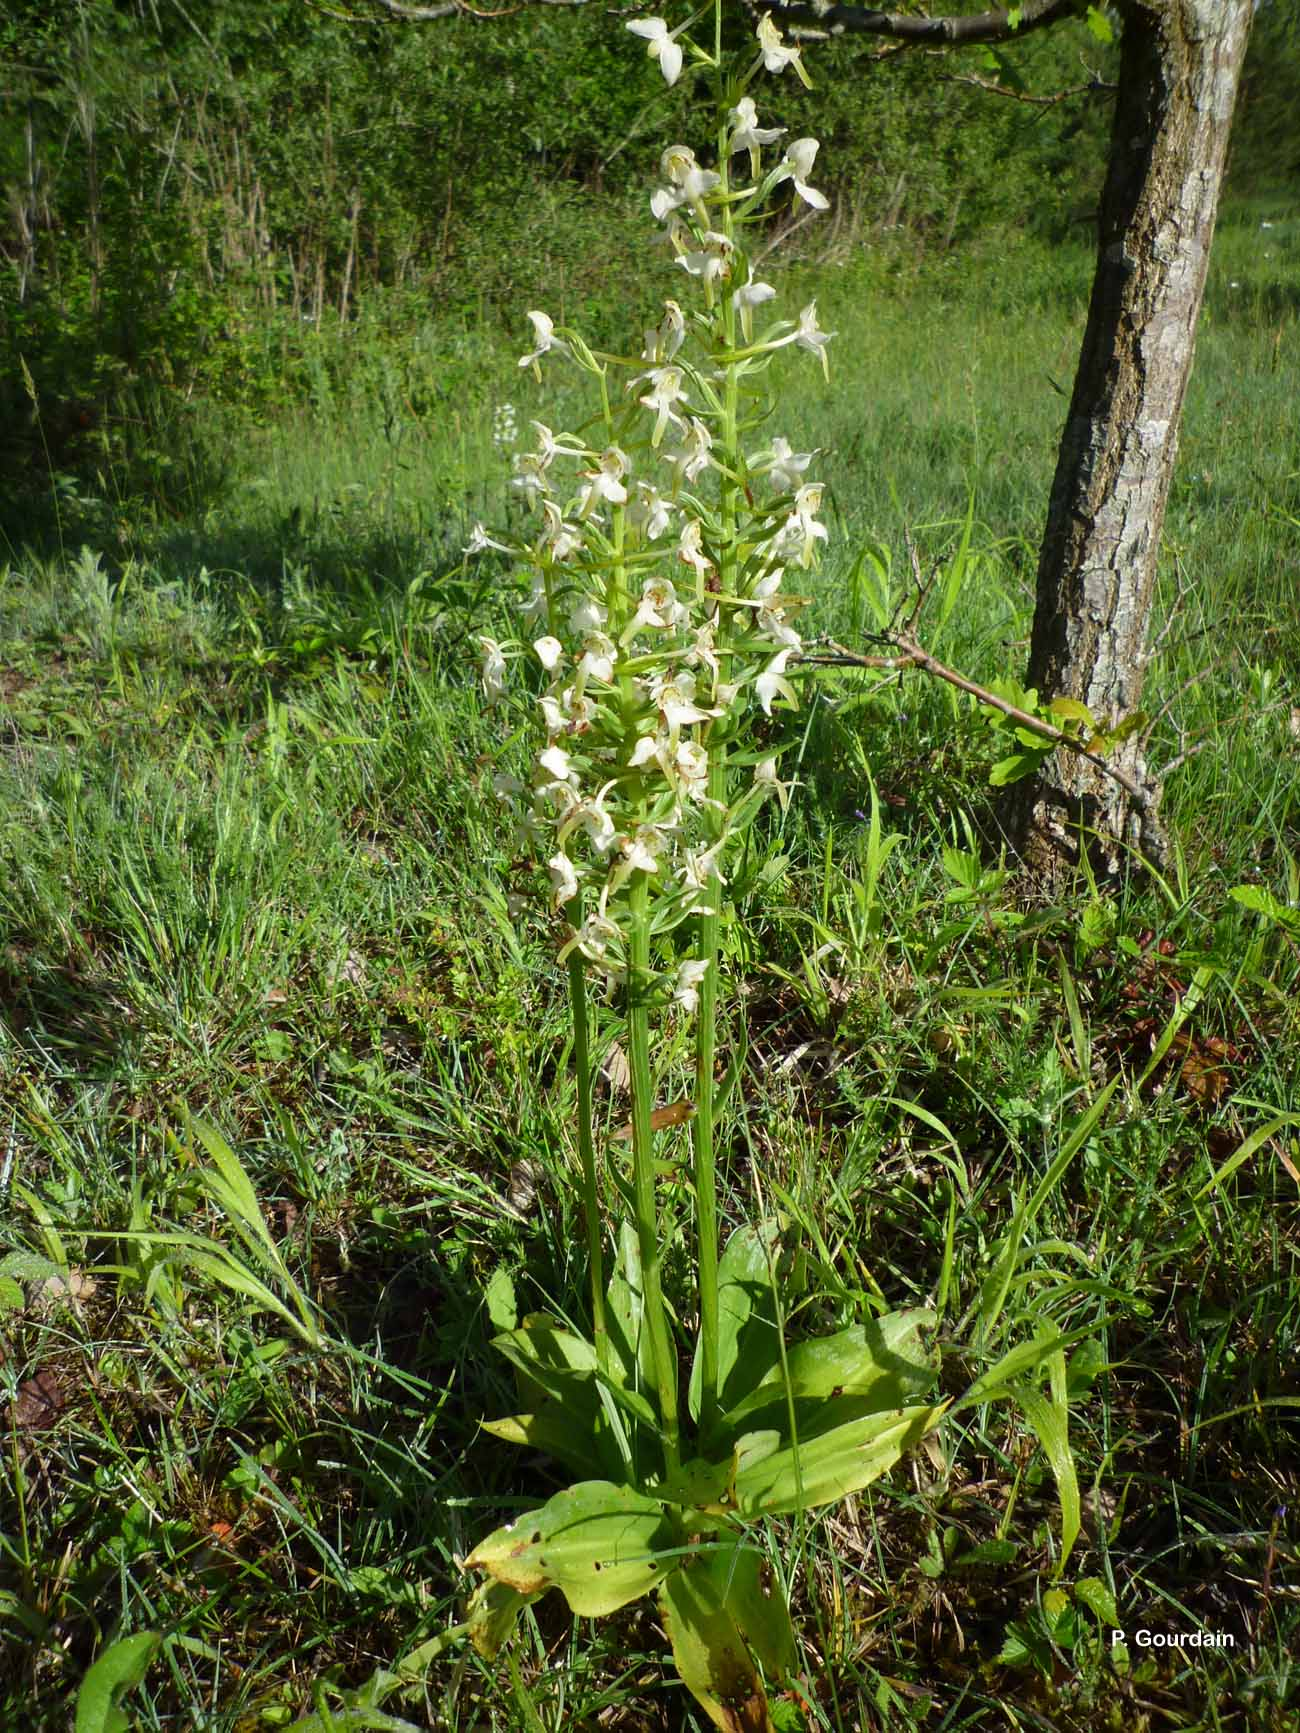 Platanthera chlorantha (Custer) Rchb., 1828 © P. Gourdain